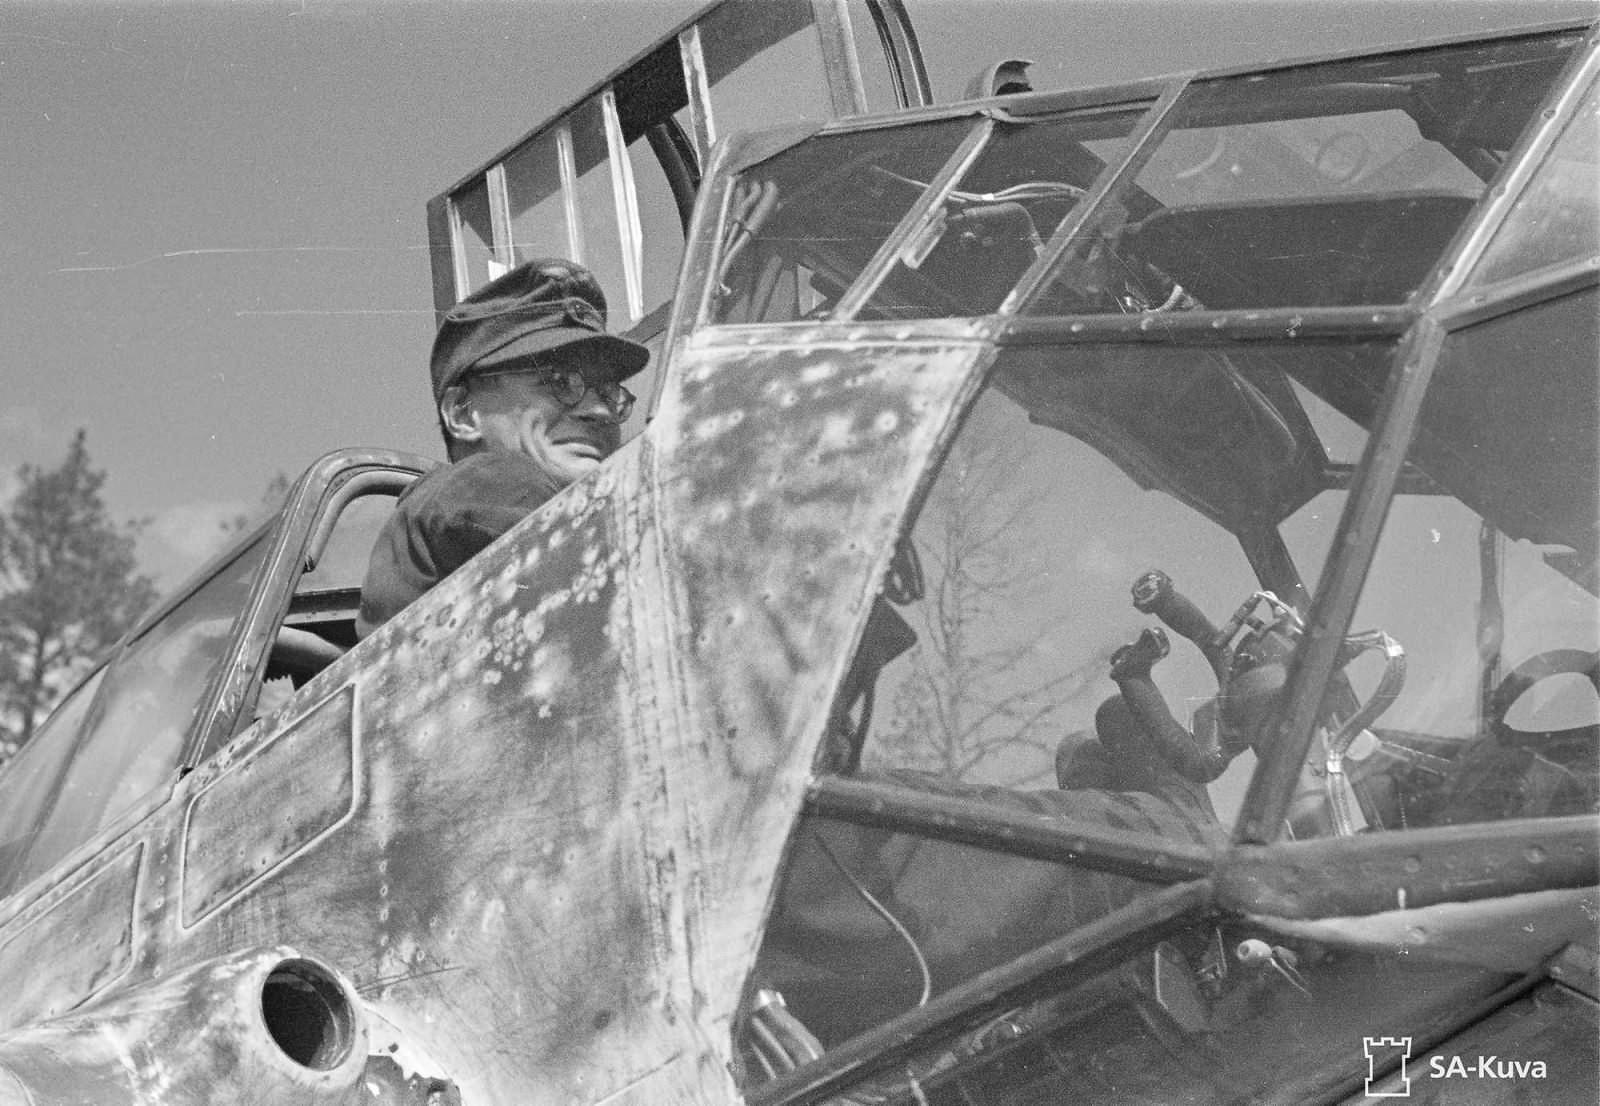 Focke-Wulf Fw 189 A-3 of the 1.(H)/32 V7+1J June 1943 5